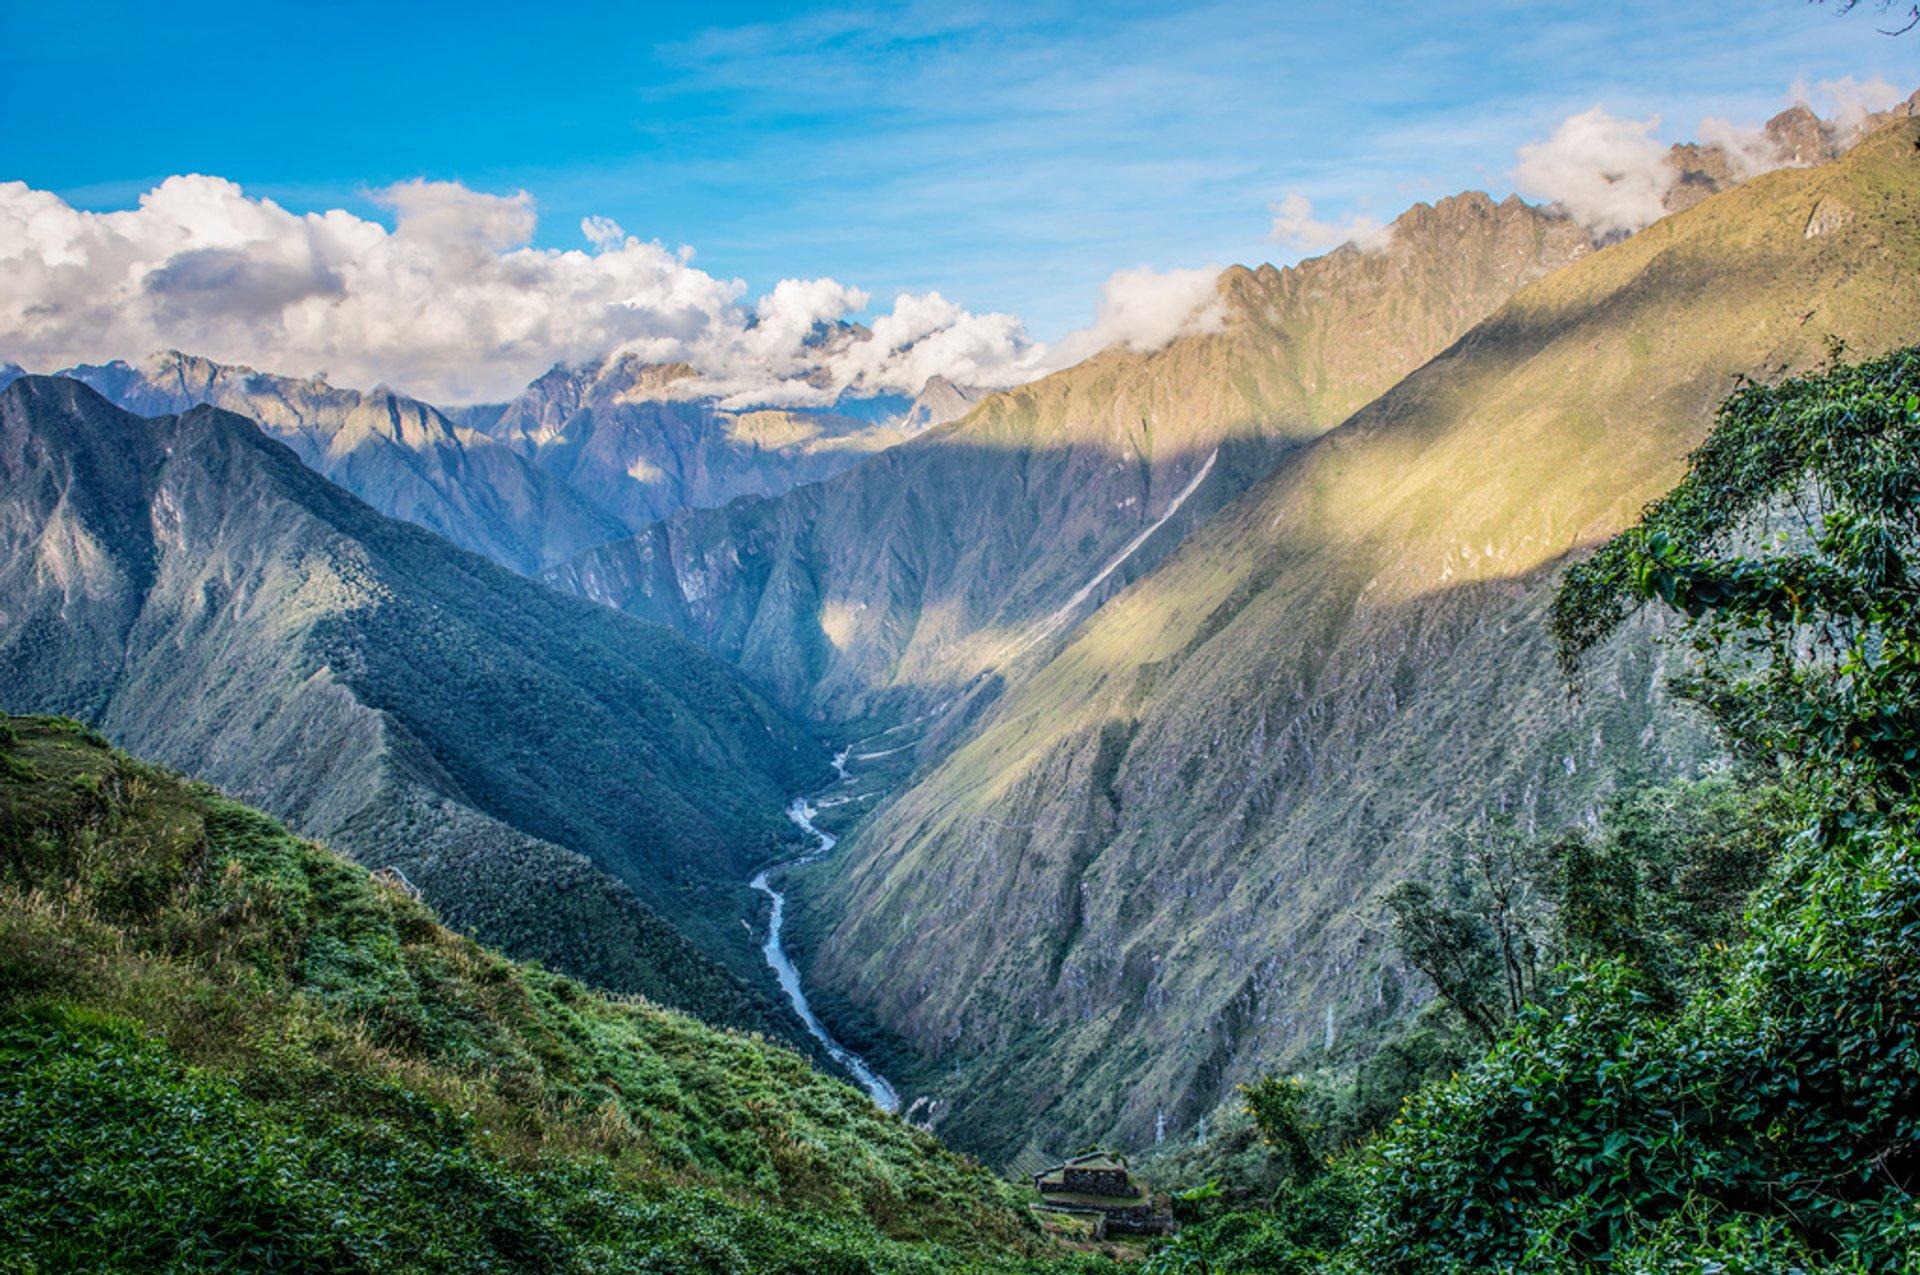 Inca Trail High Season in Machu Picchu and Cusco - Best Season 2020